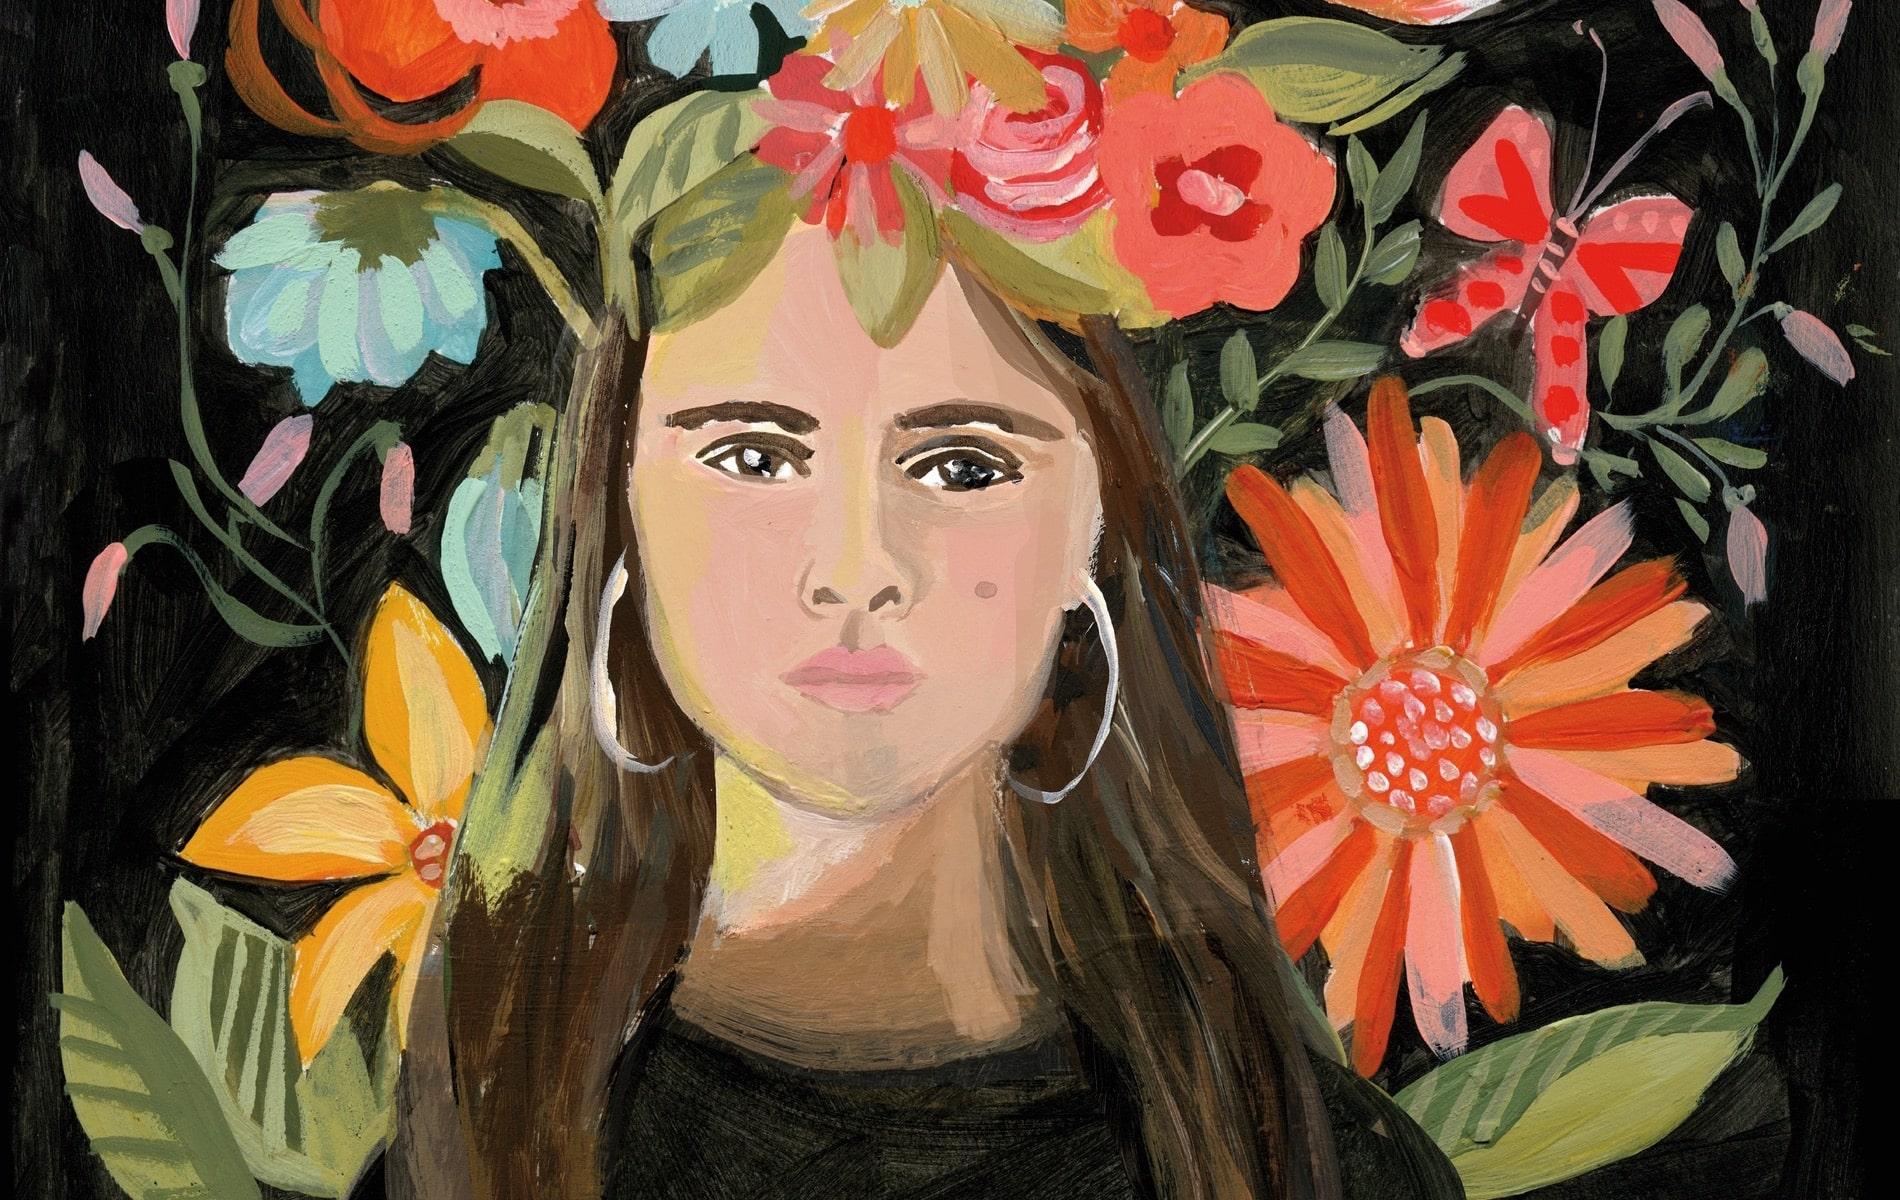 Gayle Kabaker, Xiye Bastida, Vital Voices: 100 Women Using Their Power to Empower, Assouline